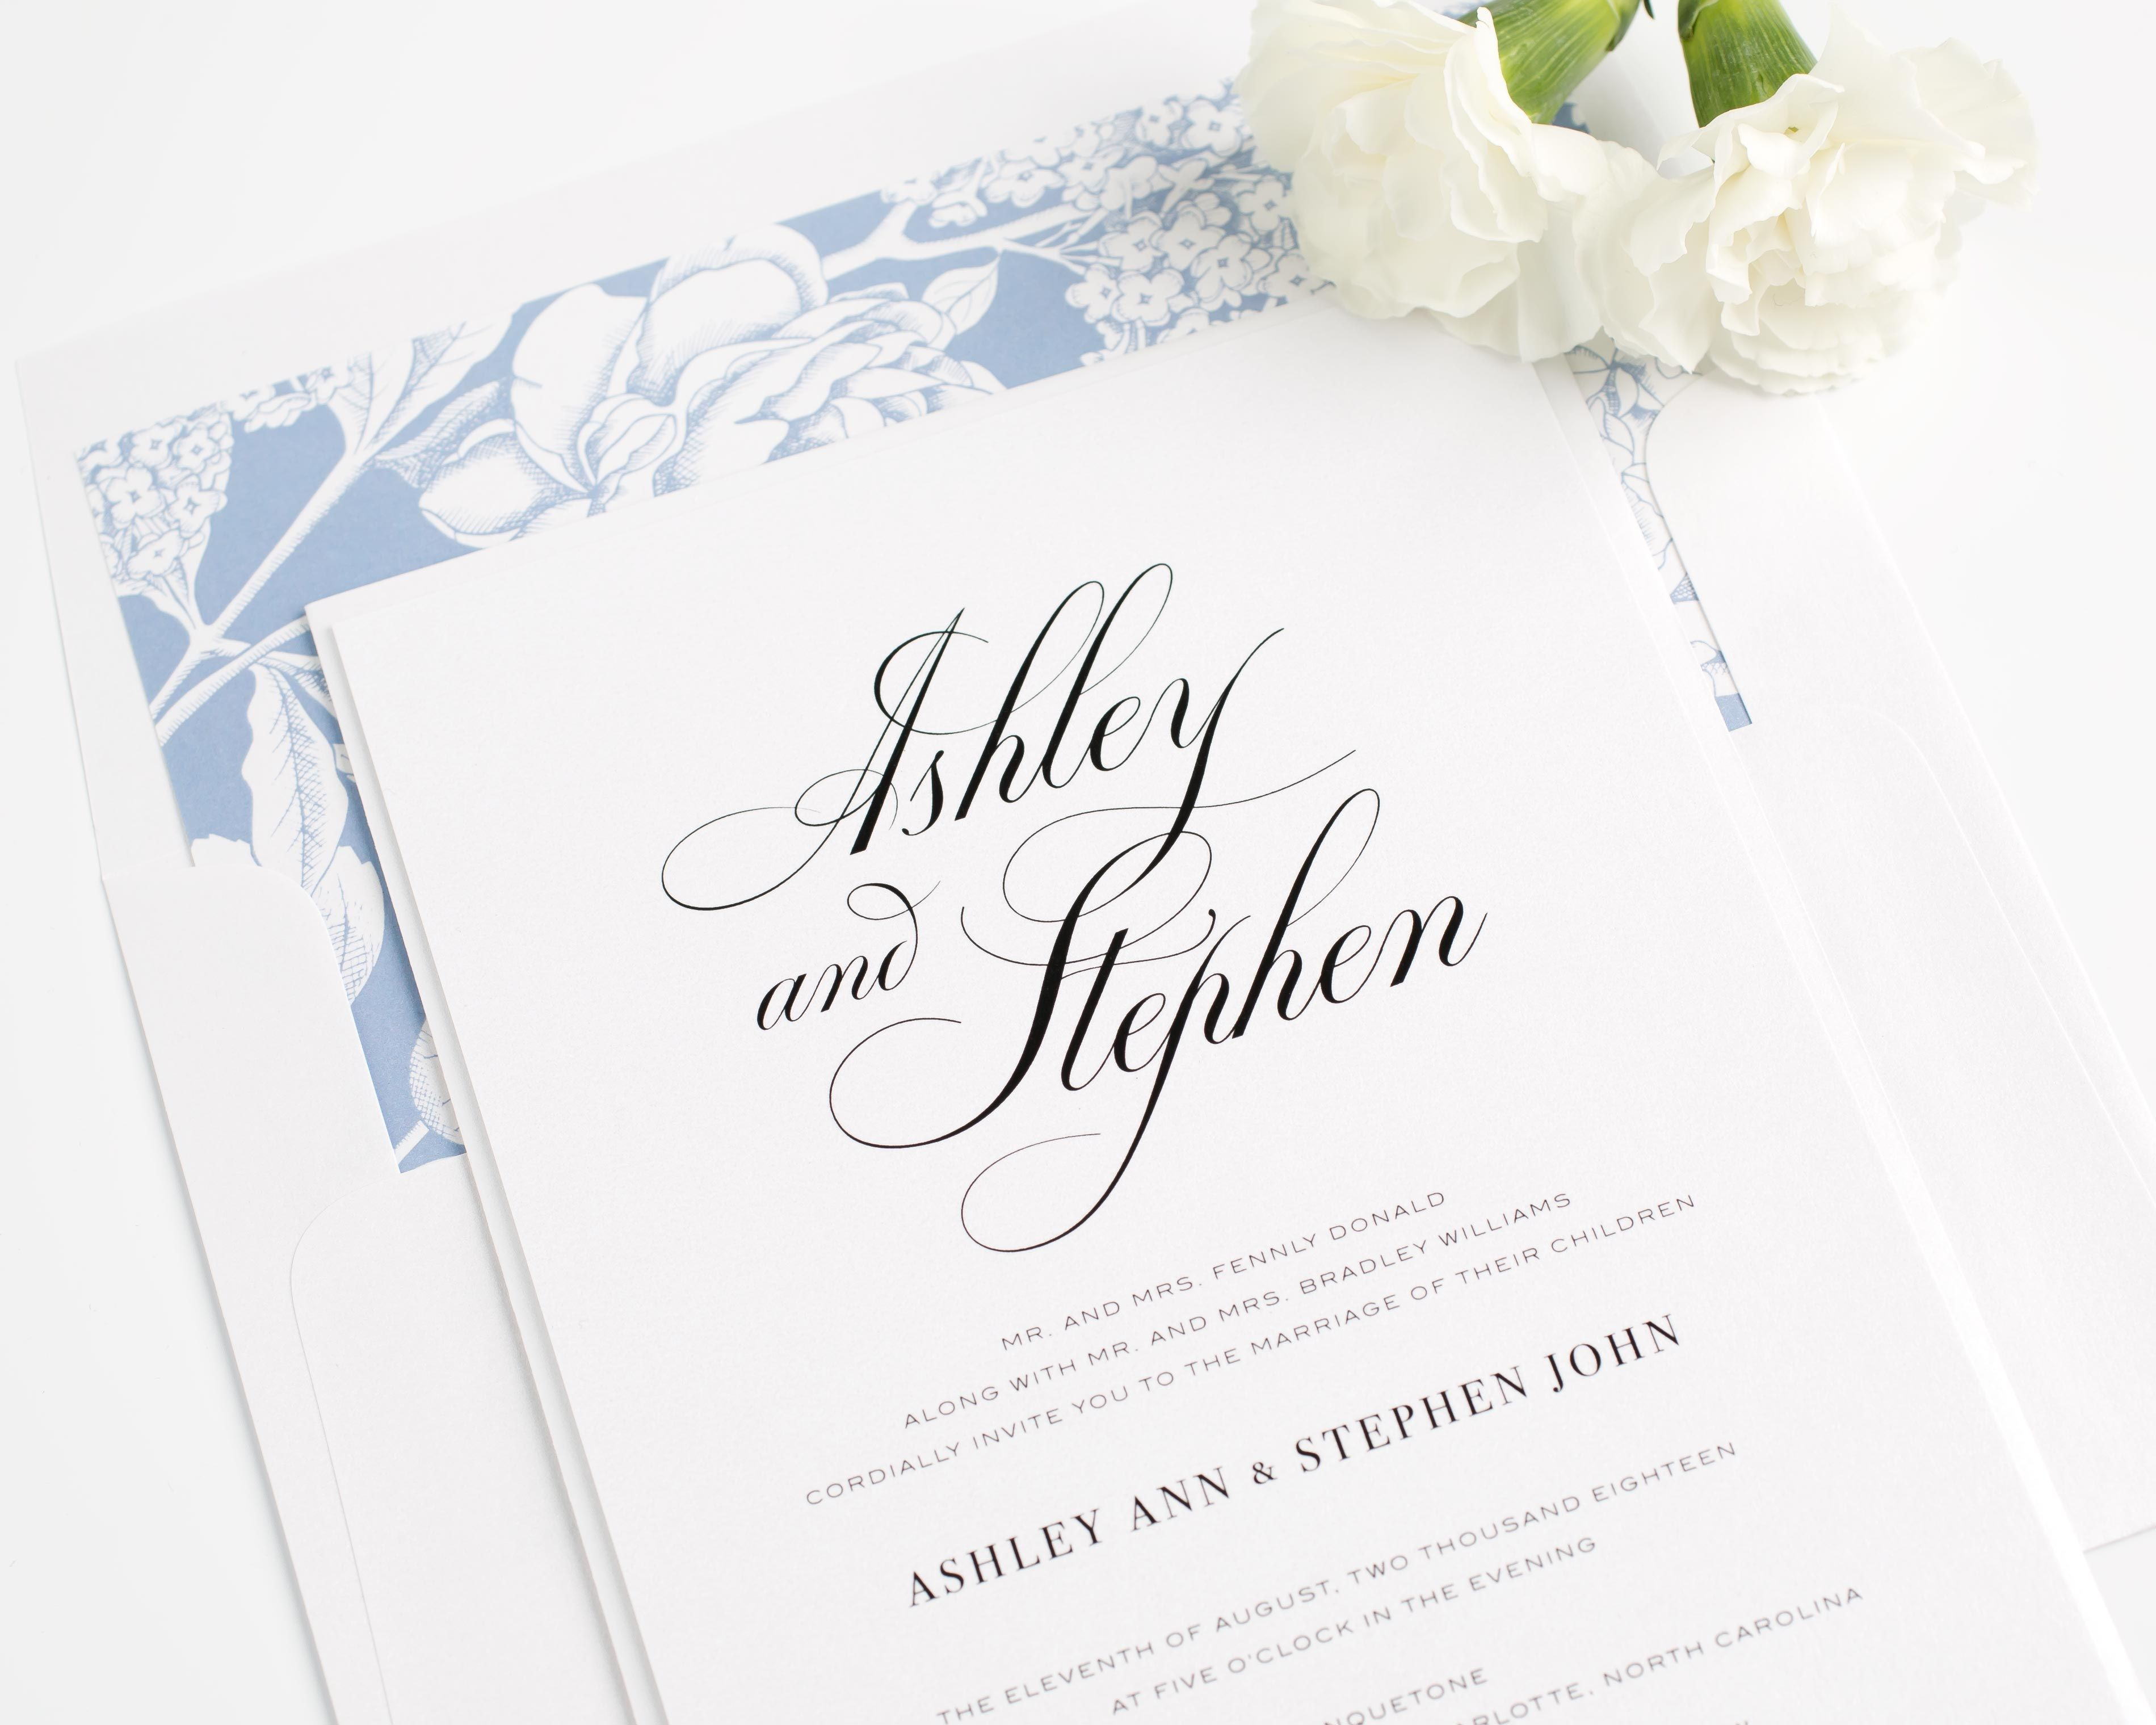 Timeless Calligraphy Wedding Invitations | zaproszenia | Pinterest ...